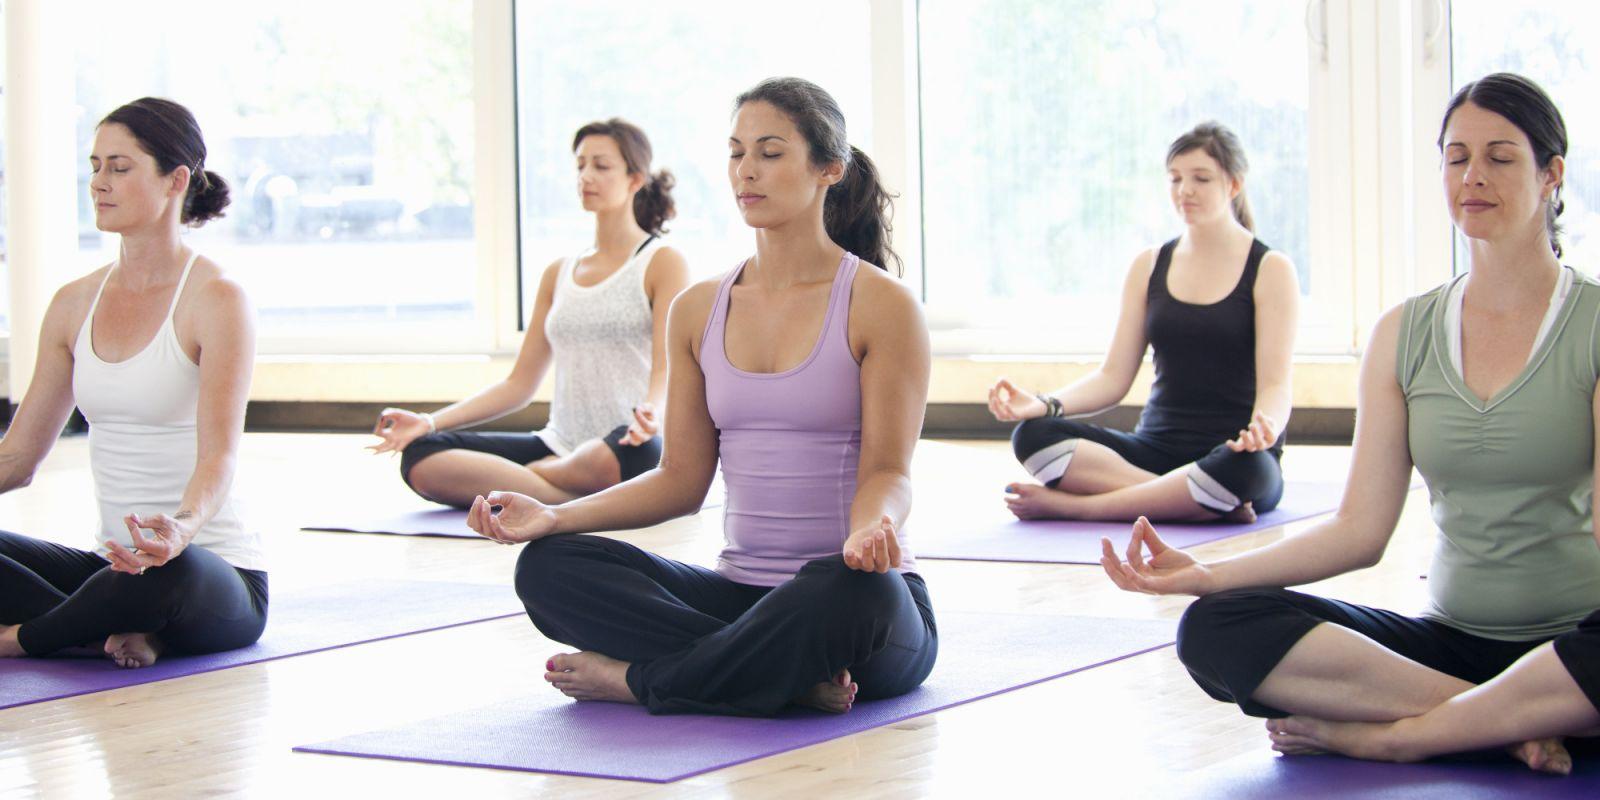 d'yoga female club